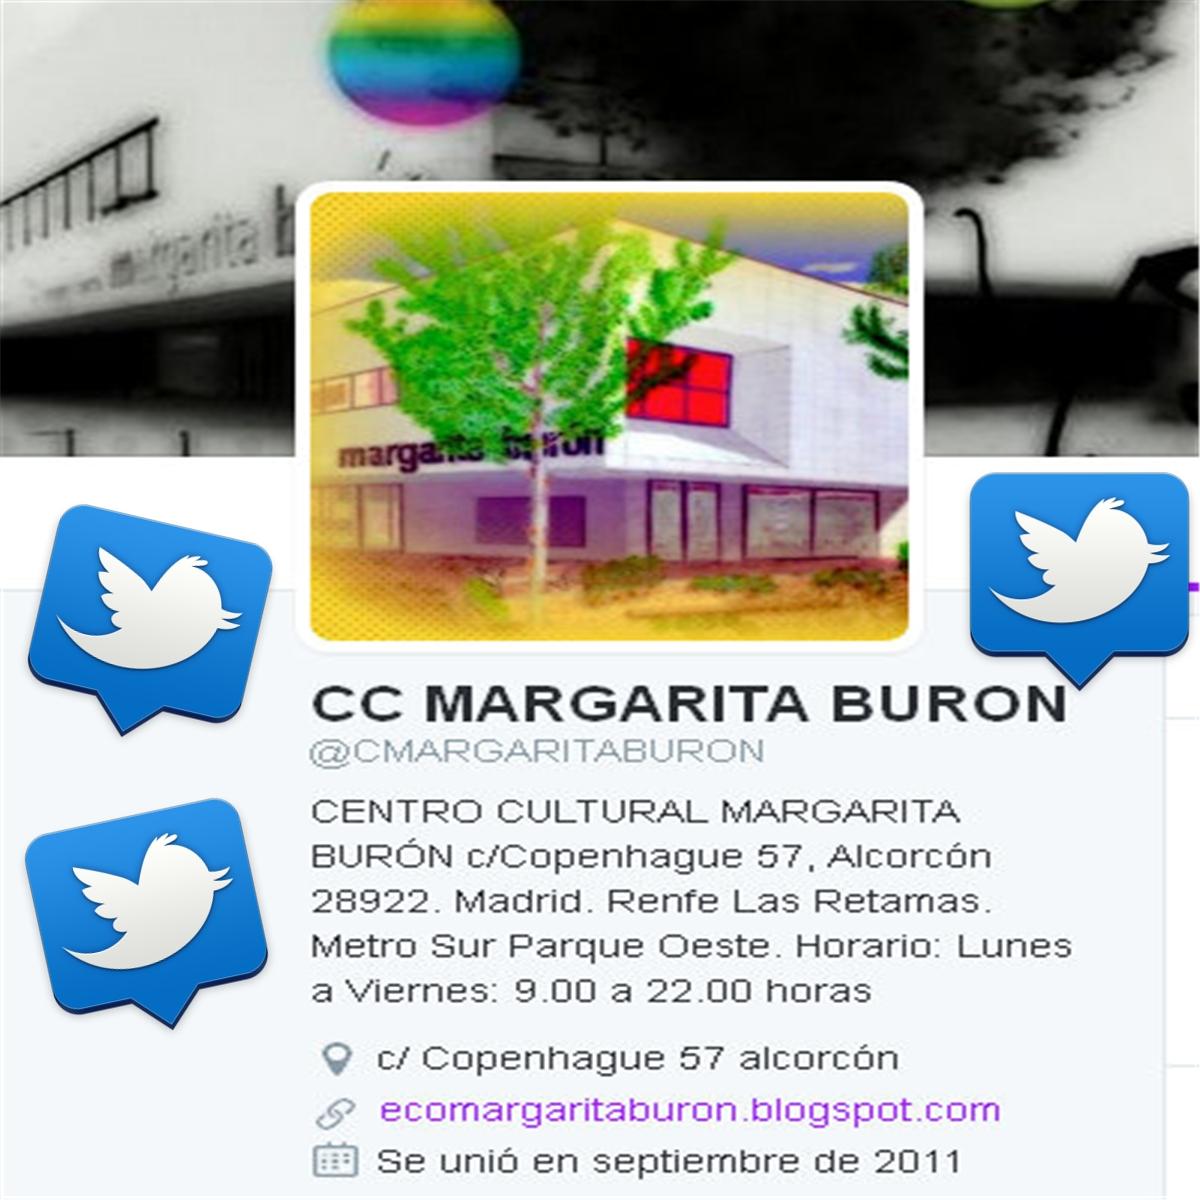 MARGARITA BURON Twitter